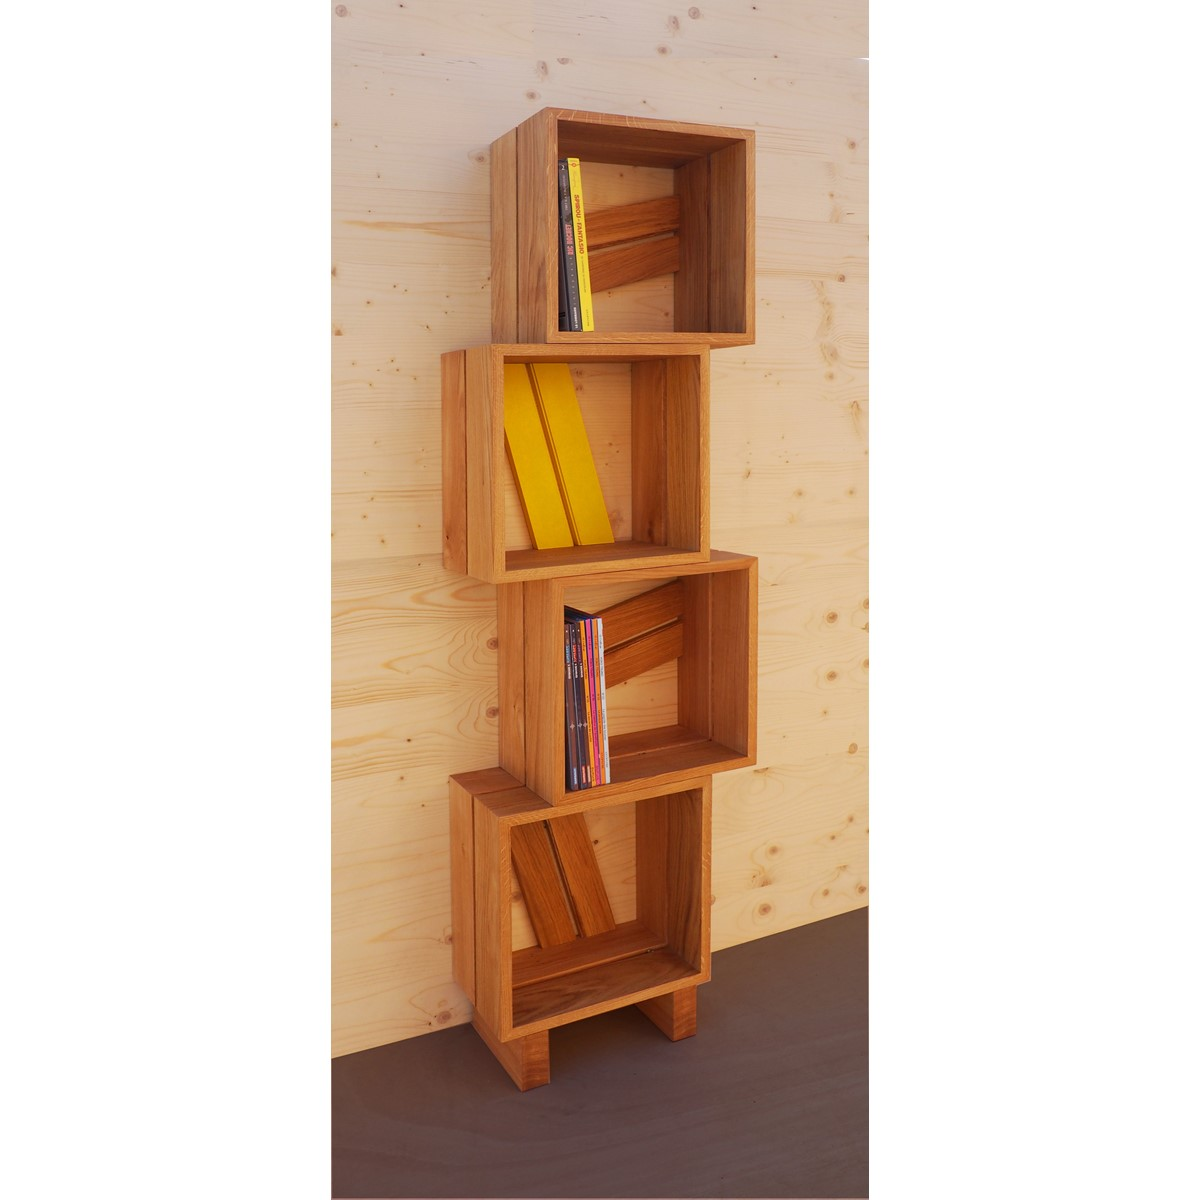 meuble bibliothque modulable trendy bibliothque vue globale with meuble bibliothque modulable. Black Bedroom Furniture Sets. Home Design Ideas